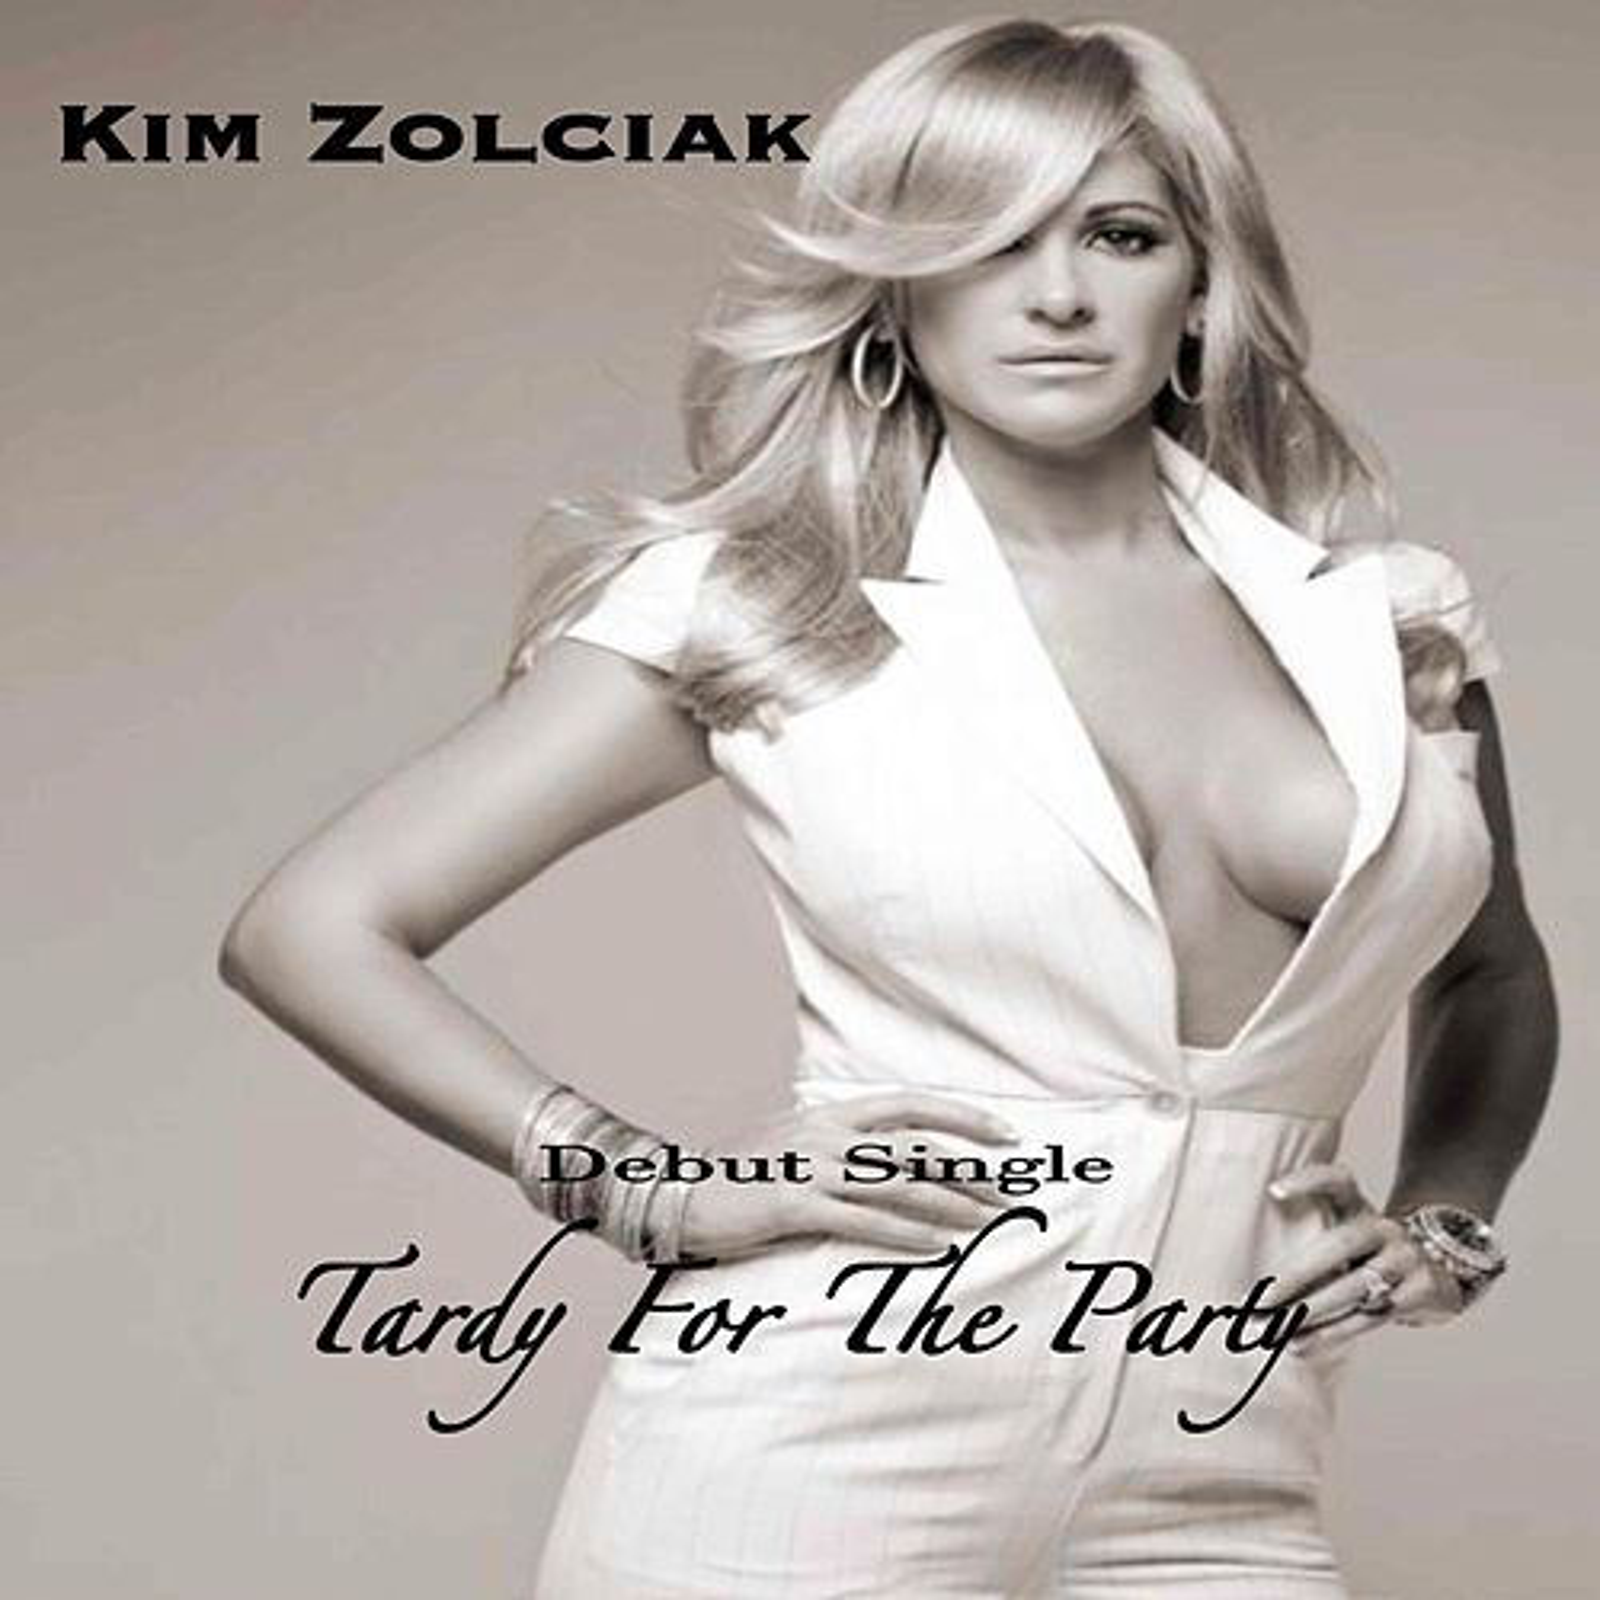 Tardy for the Party by Kim Zolciak